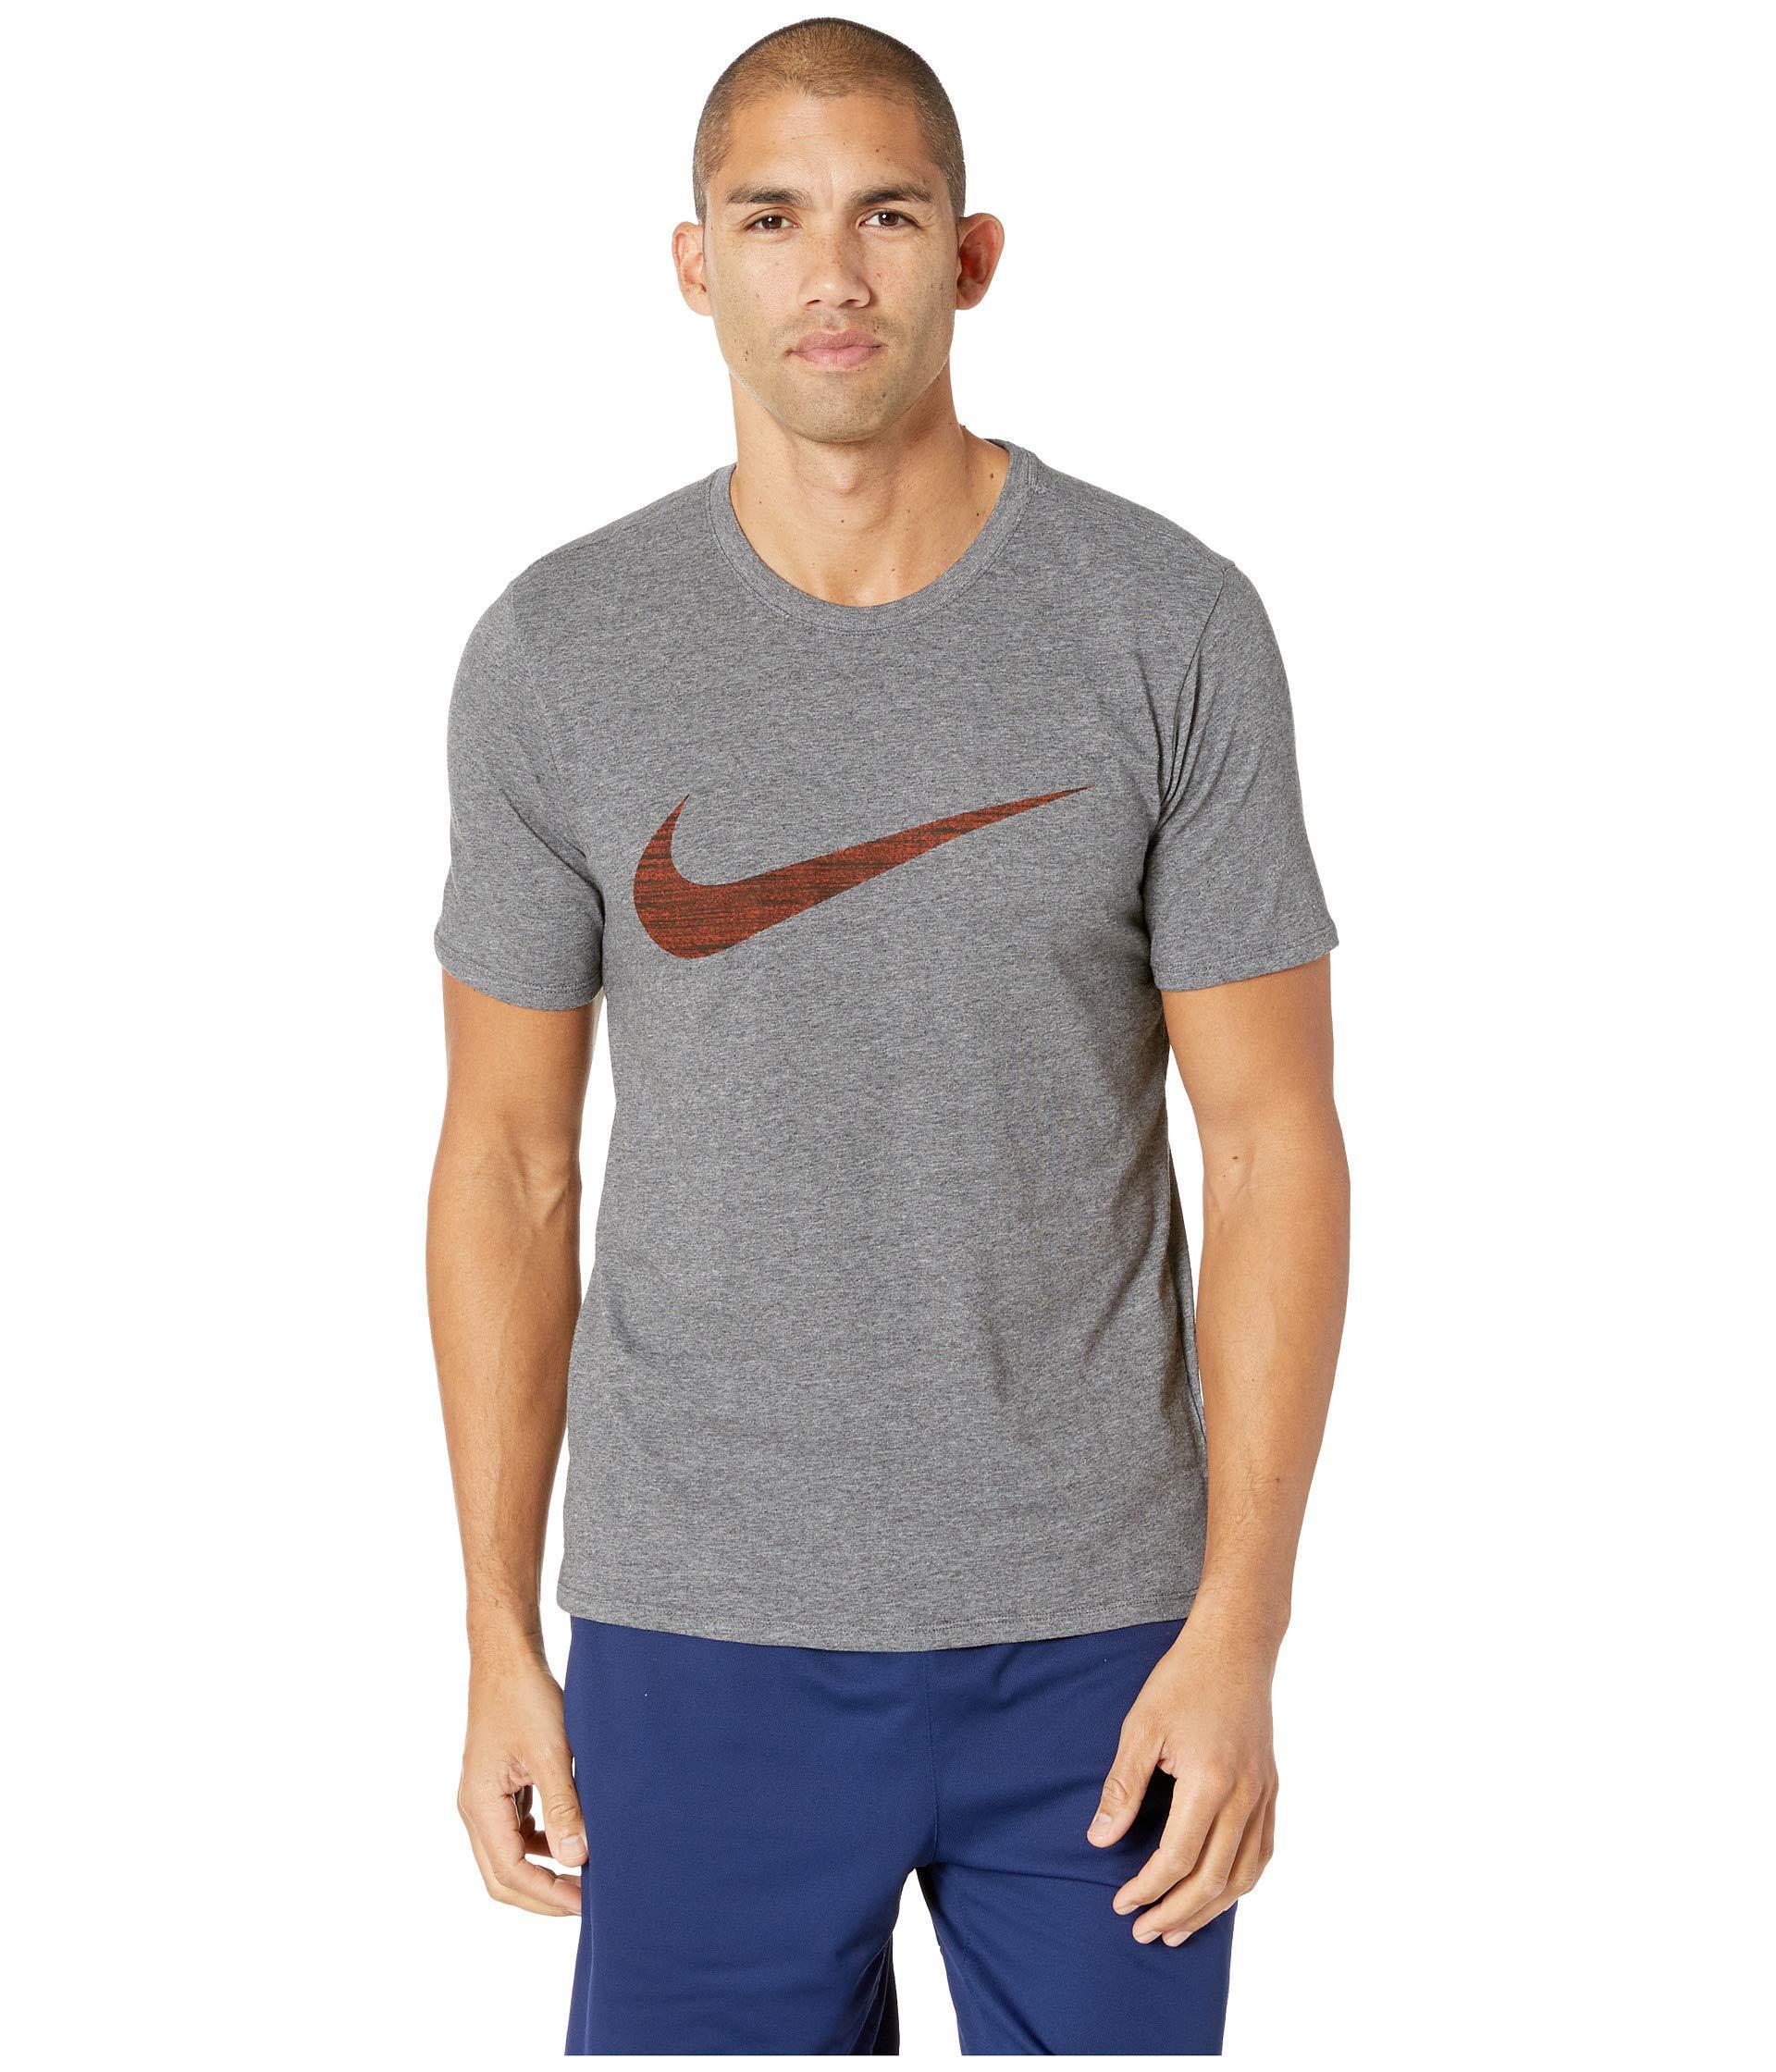 ec4fb74fd409 Lyst - Nike Nsw Tee Camo Pack 2 (black neutral Olive) Men s T Shirt ...